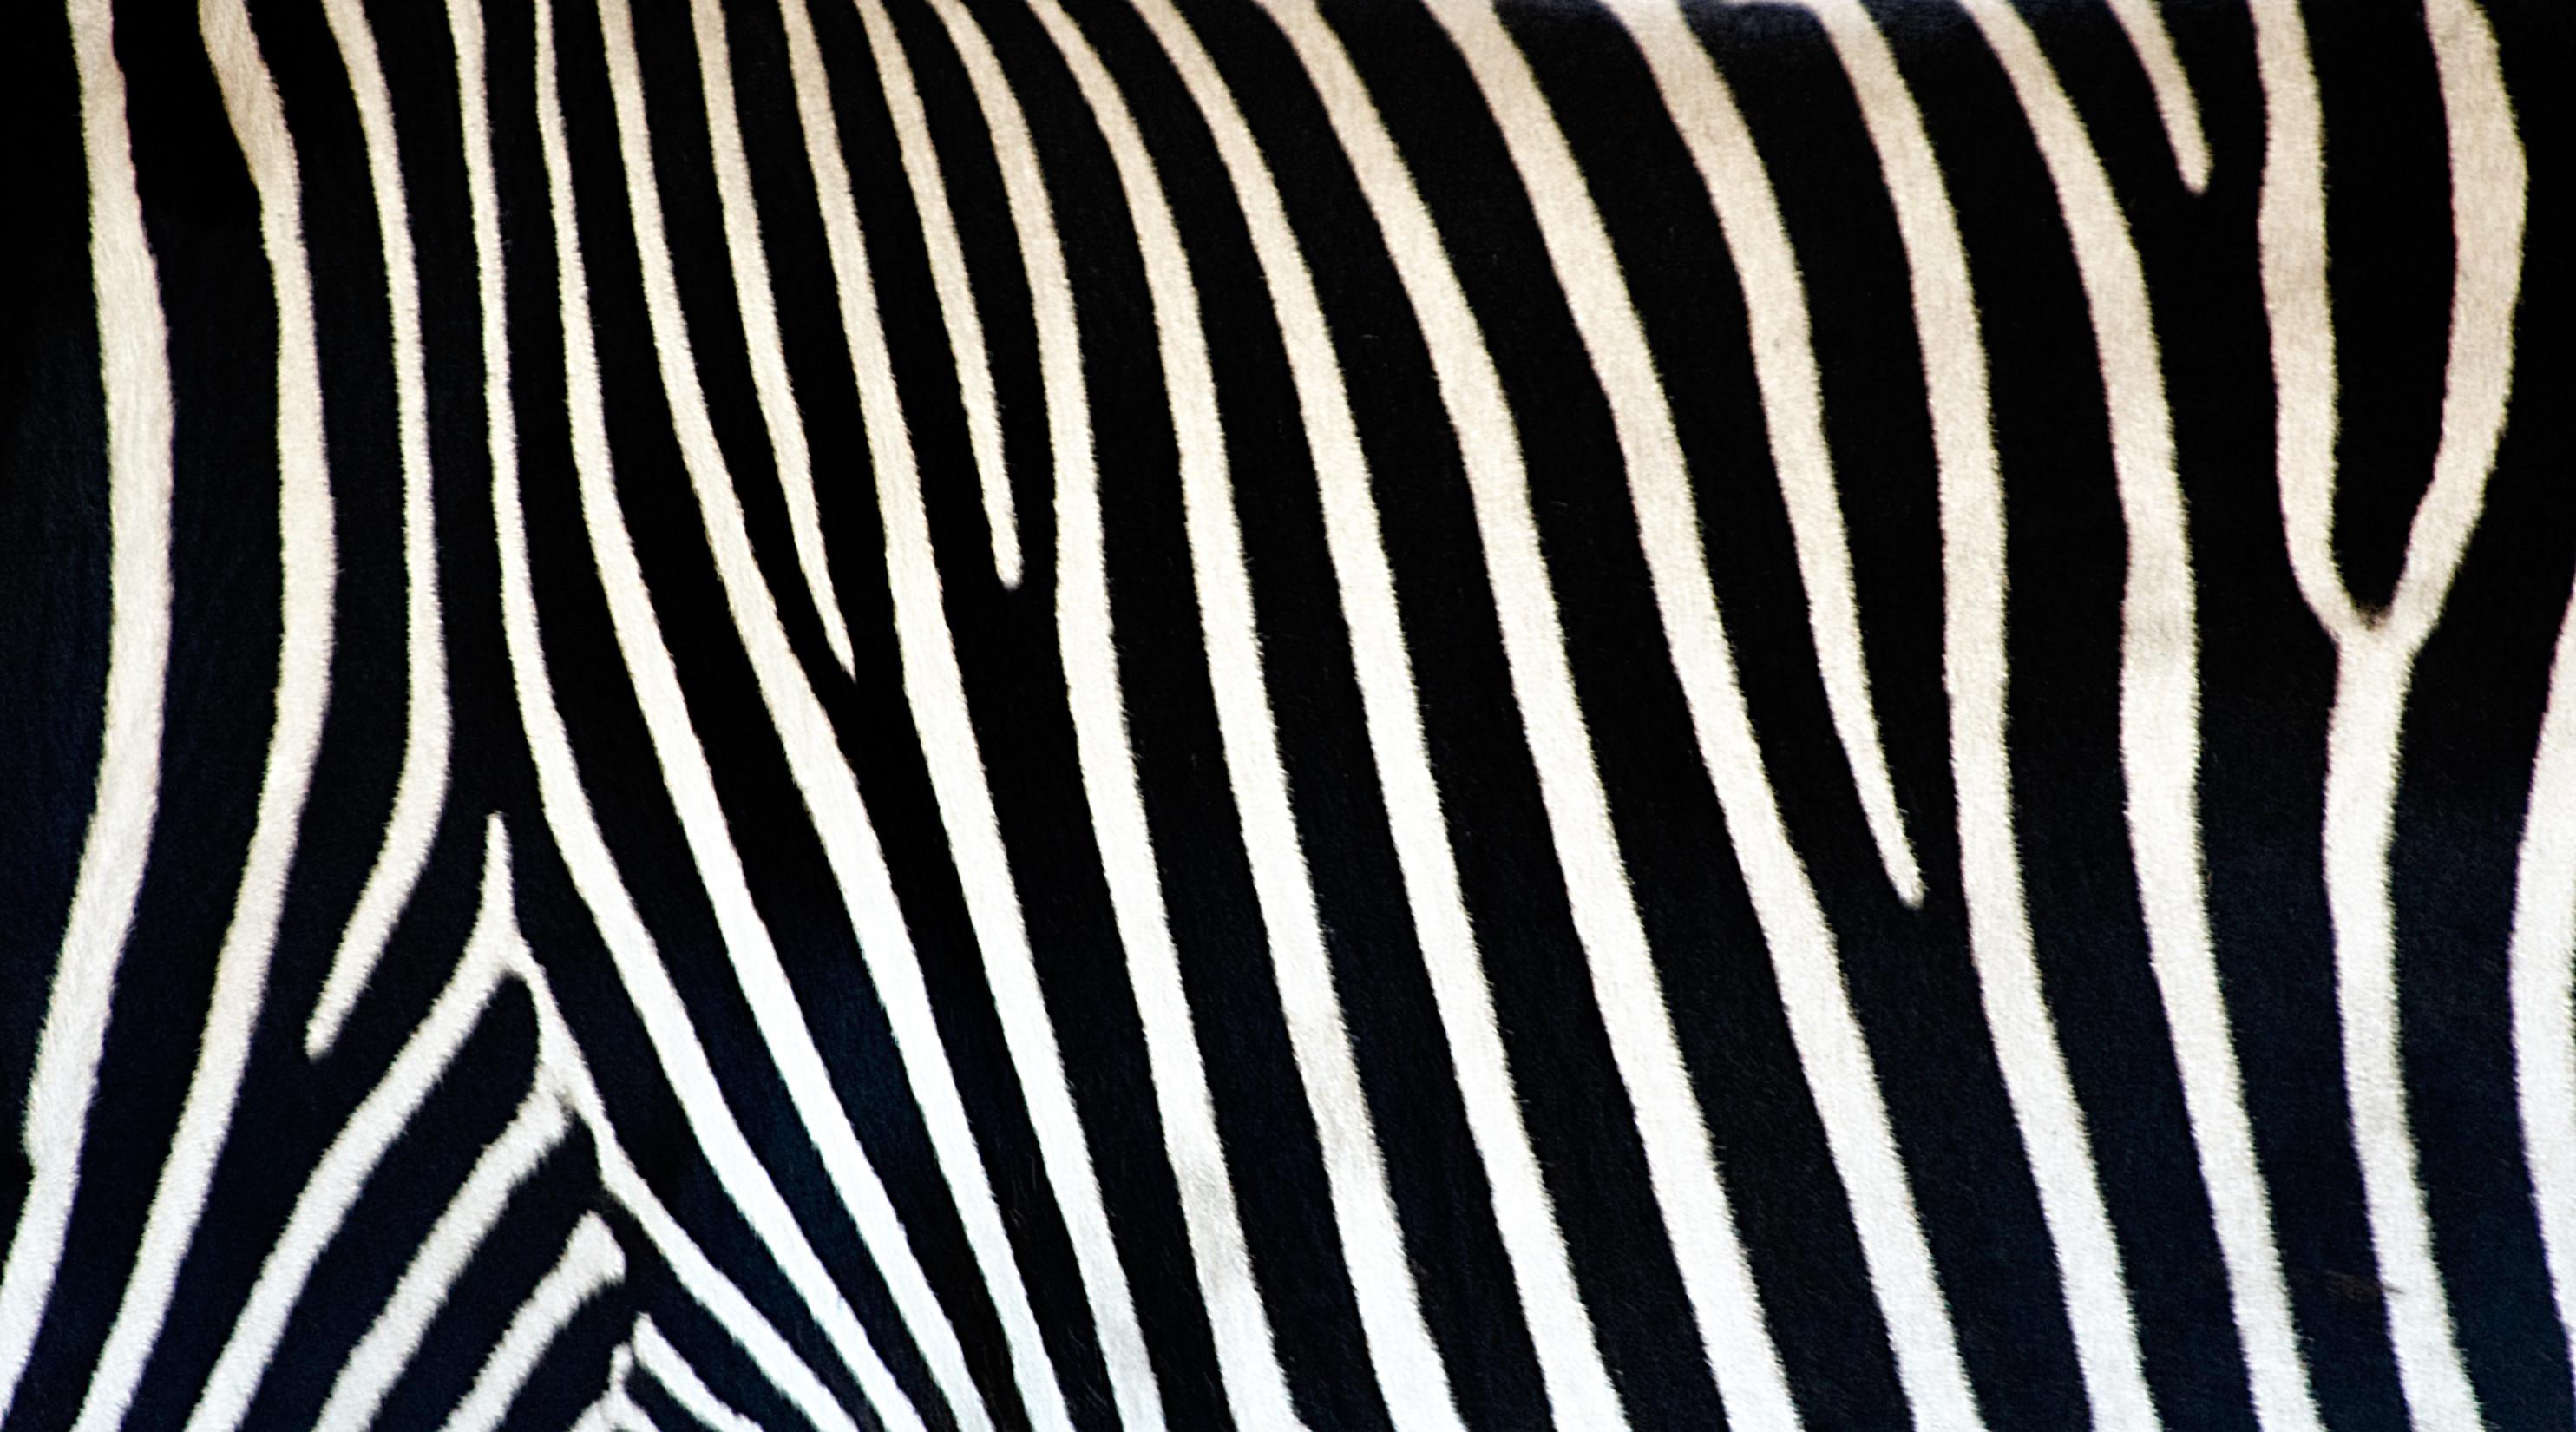 Amazing Zebra Wallpaper Zebra Print Wallpaper 2014 2969x1650